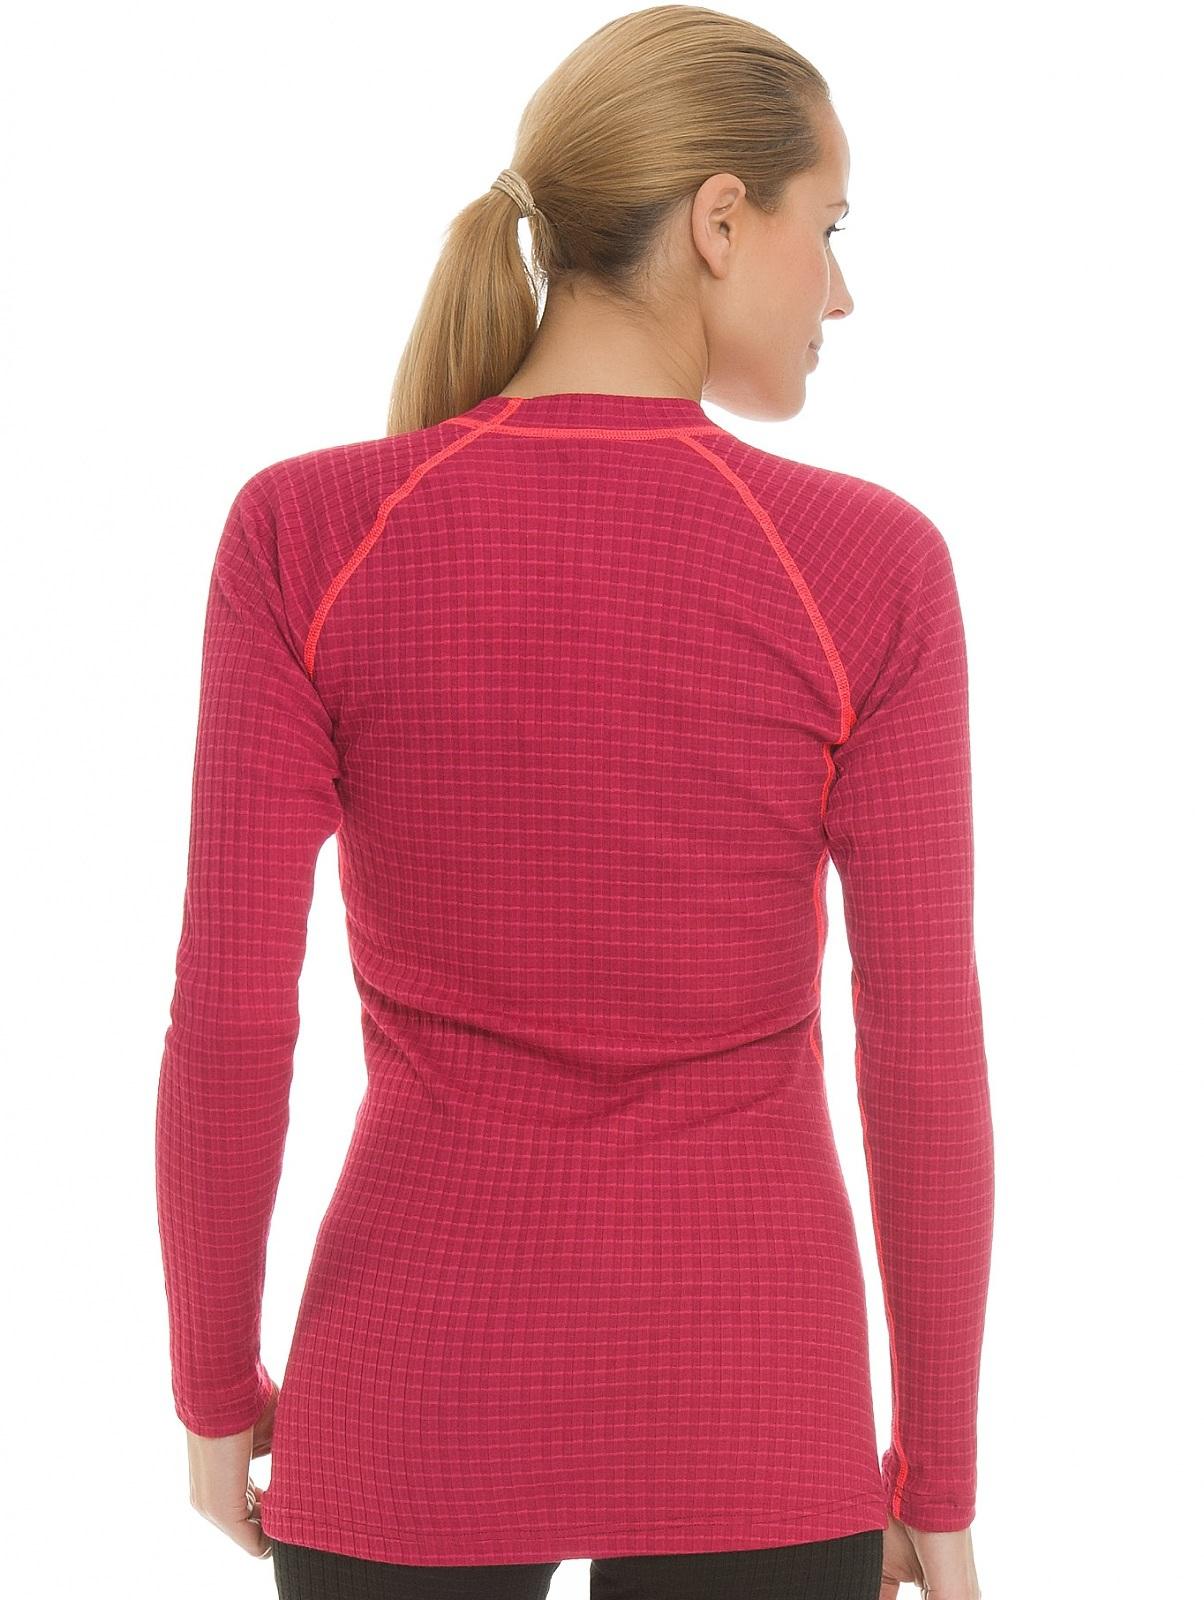 Женский комплект термобелья крафт Warm Wool Red (1903724-2482-1903725-2482)